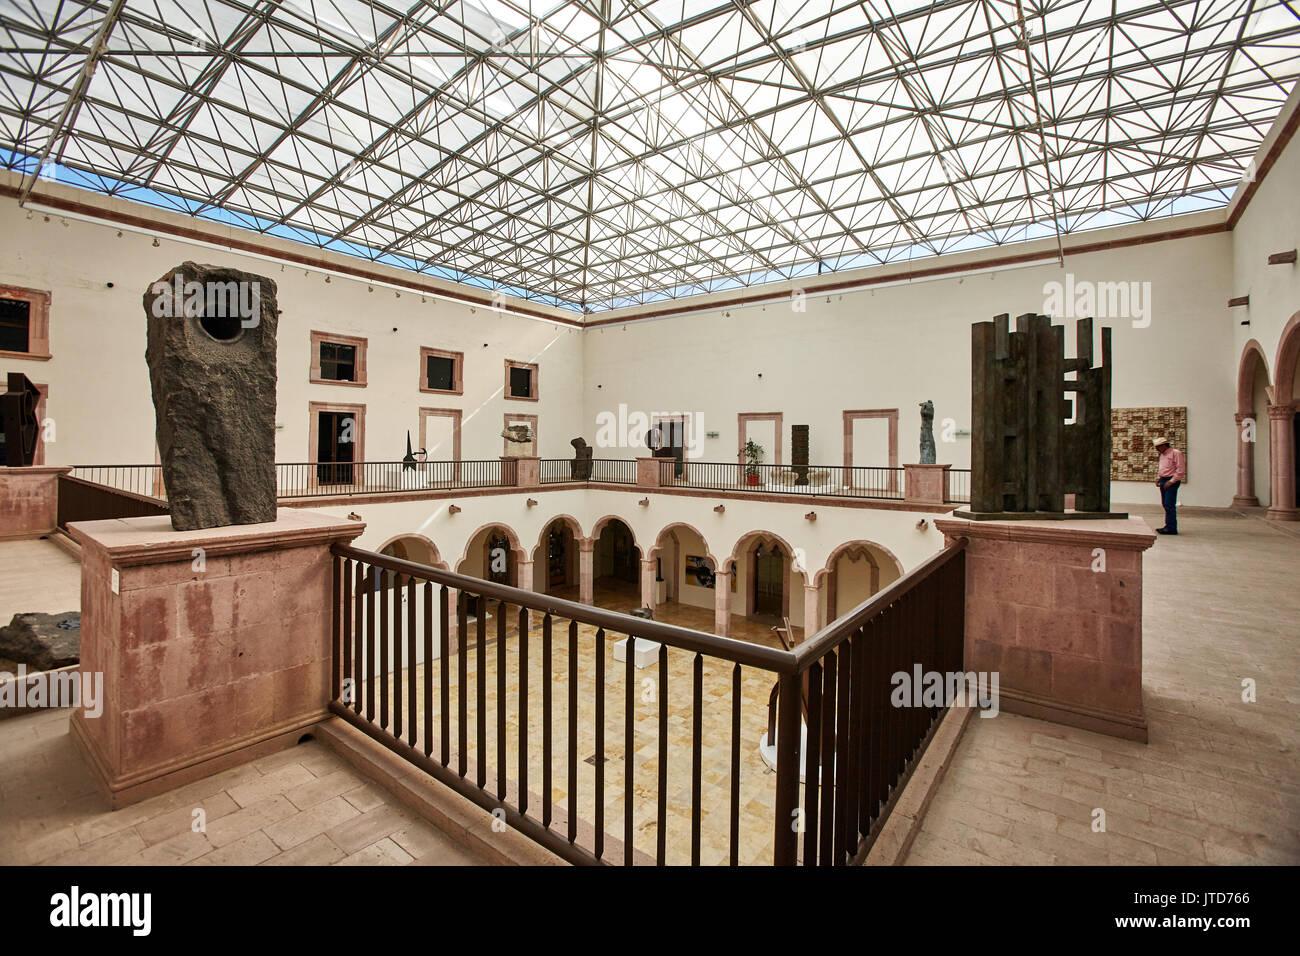 America; Mexico; Zacatecas city; Art Abstract Manuel Felgueréz Museum   The Museo Manuel Felguerez is located - Stock Image